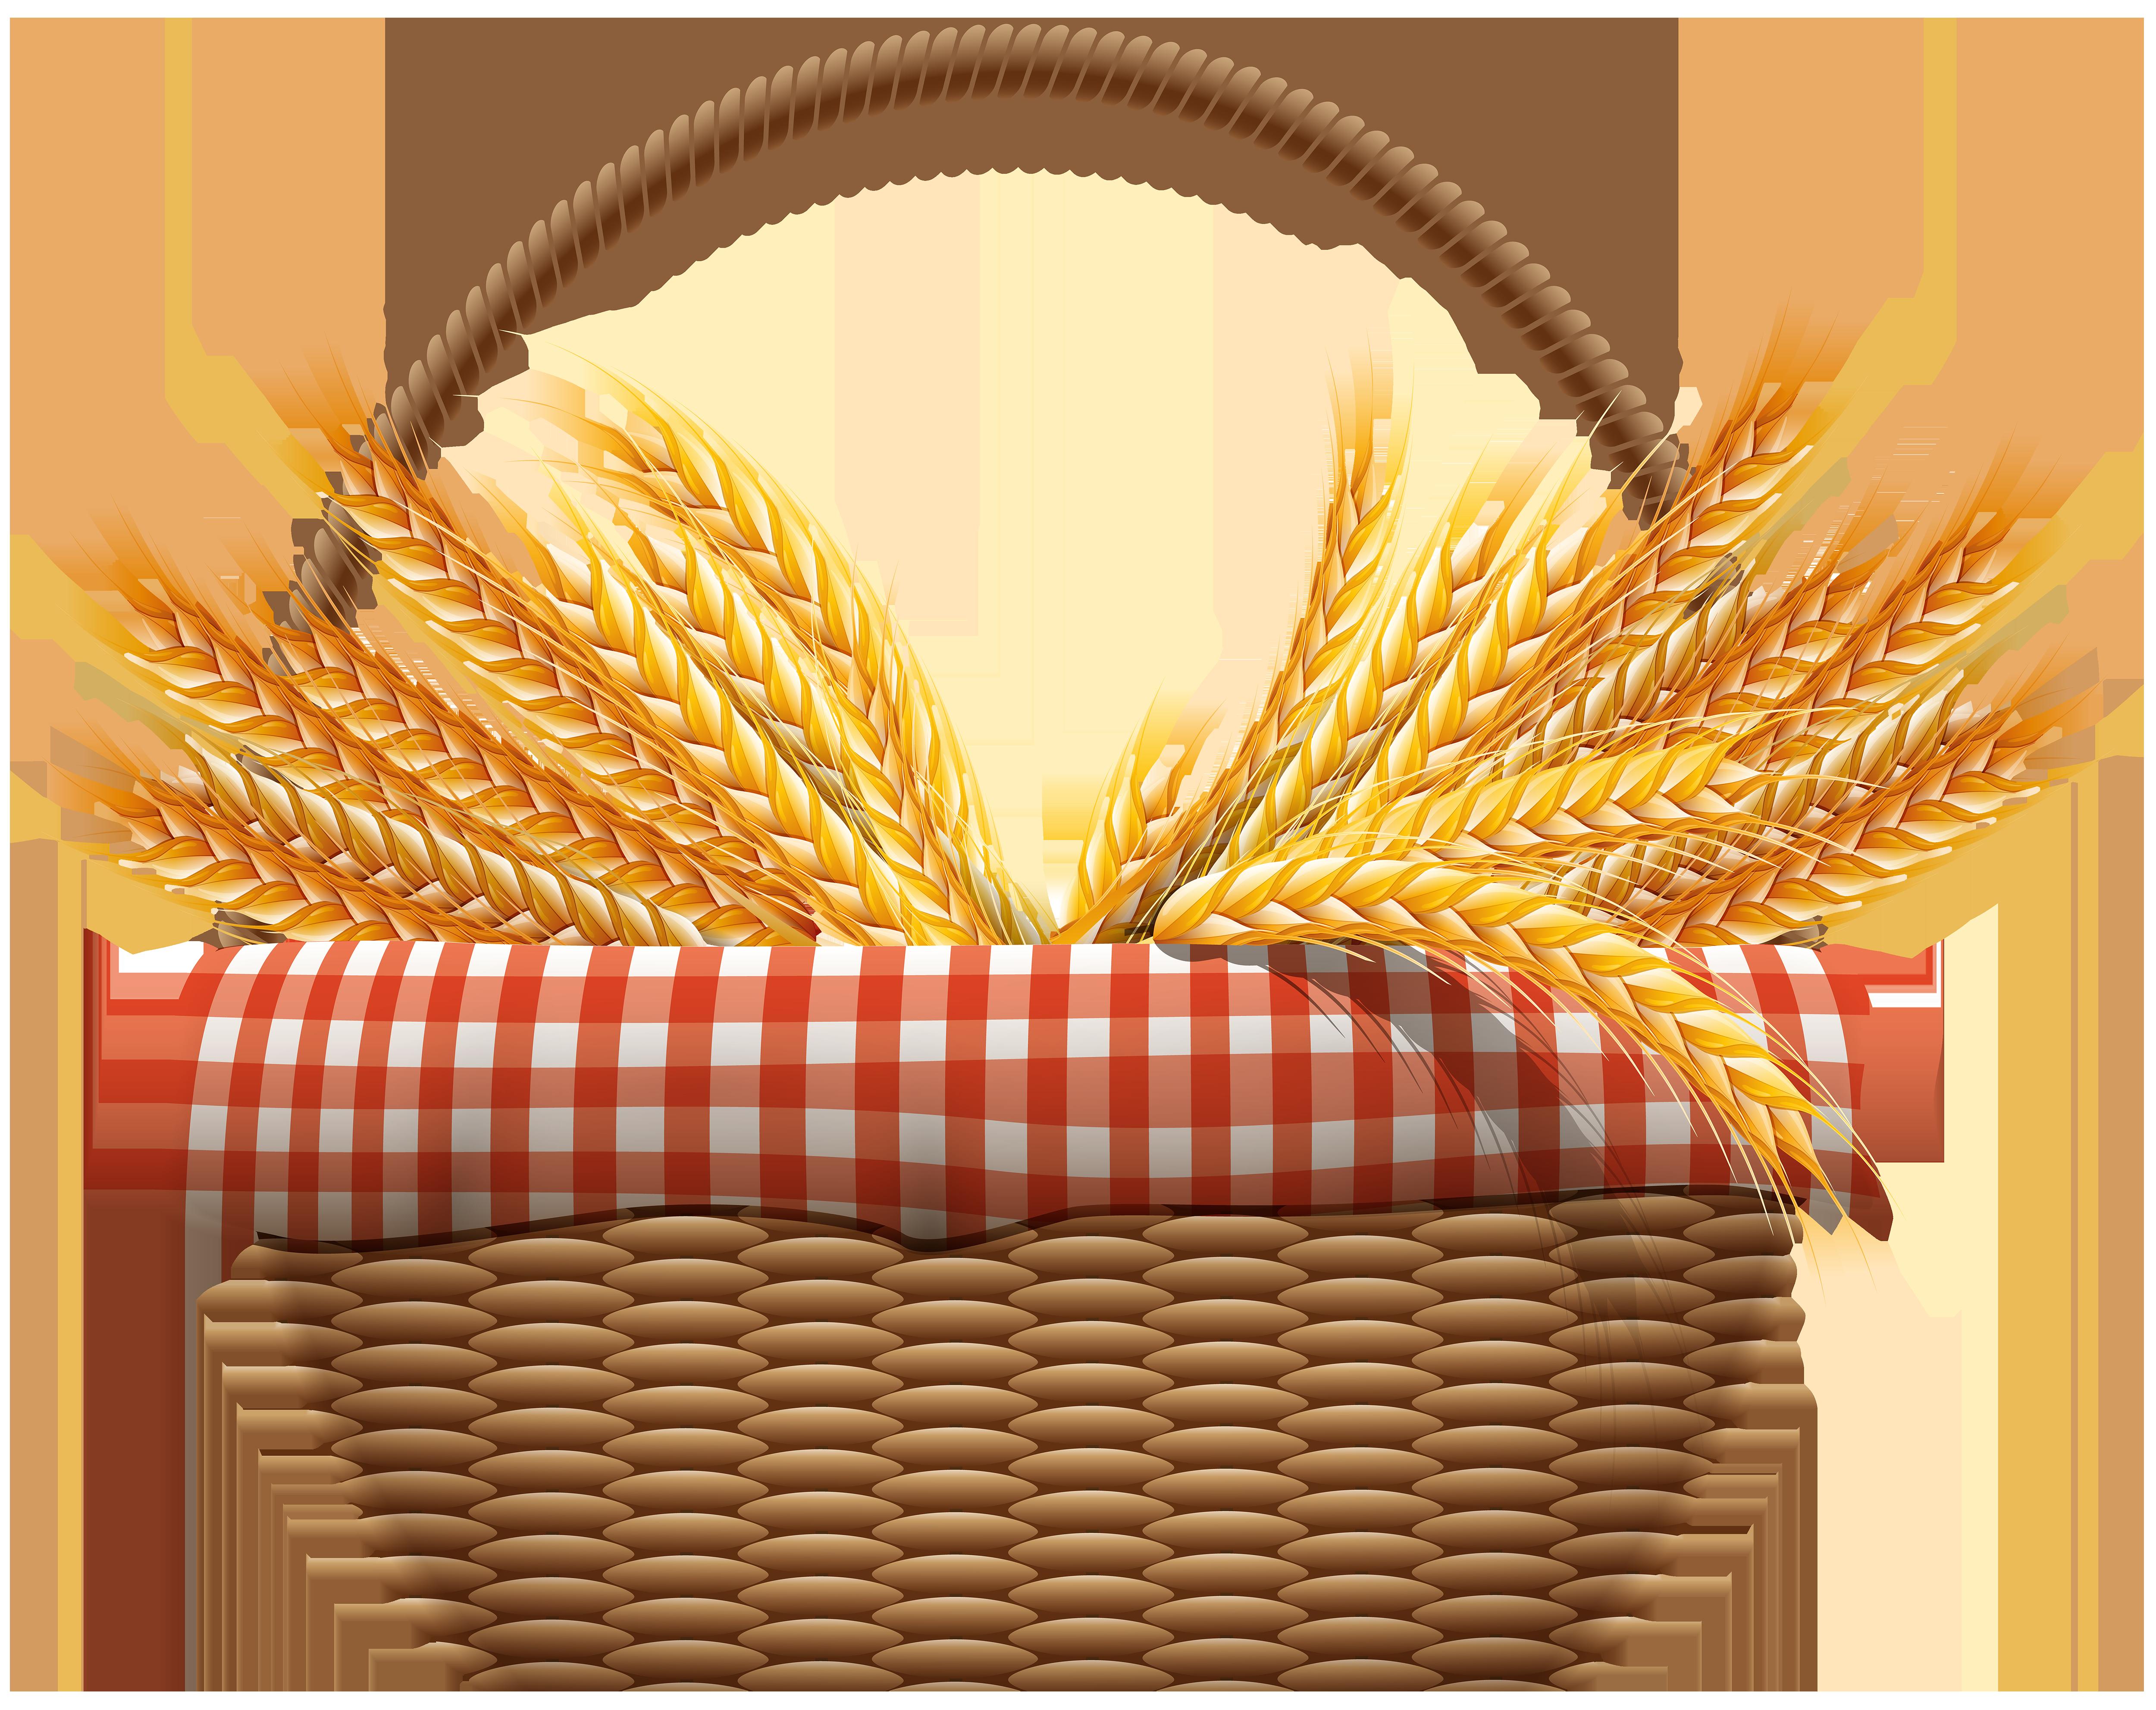 Pear clipart basket. Wheat computer file autumn